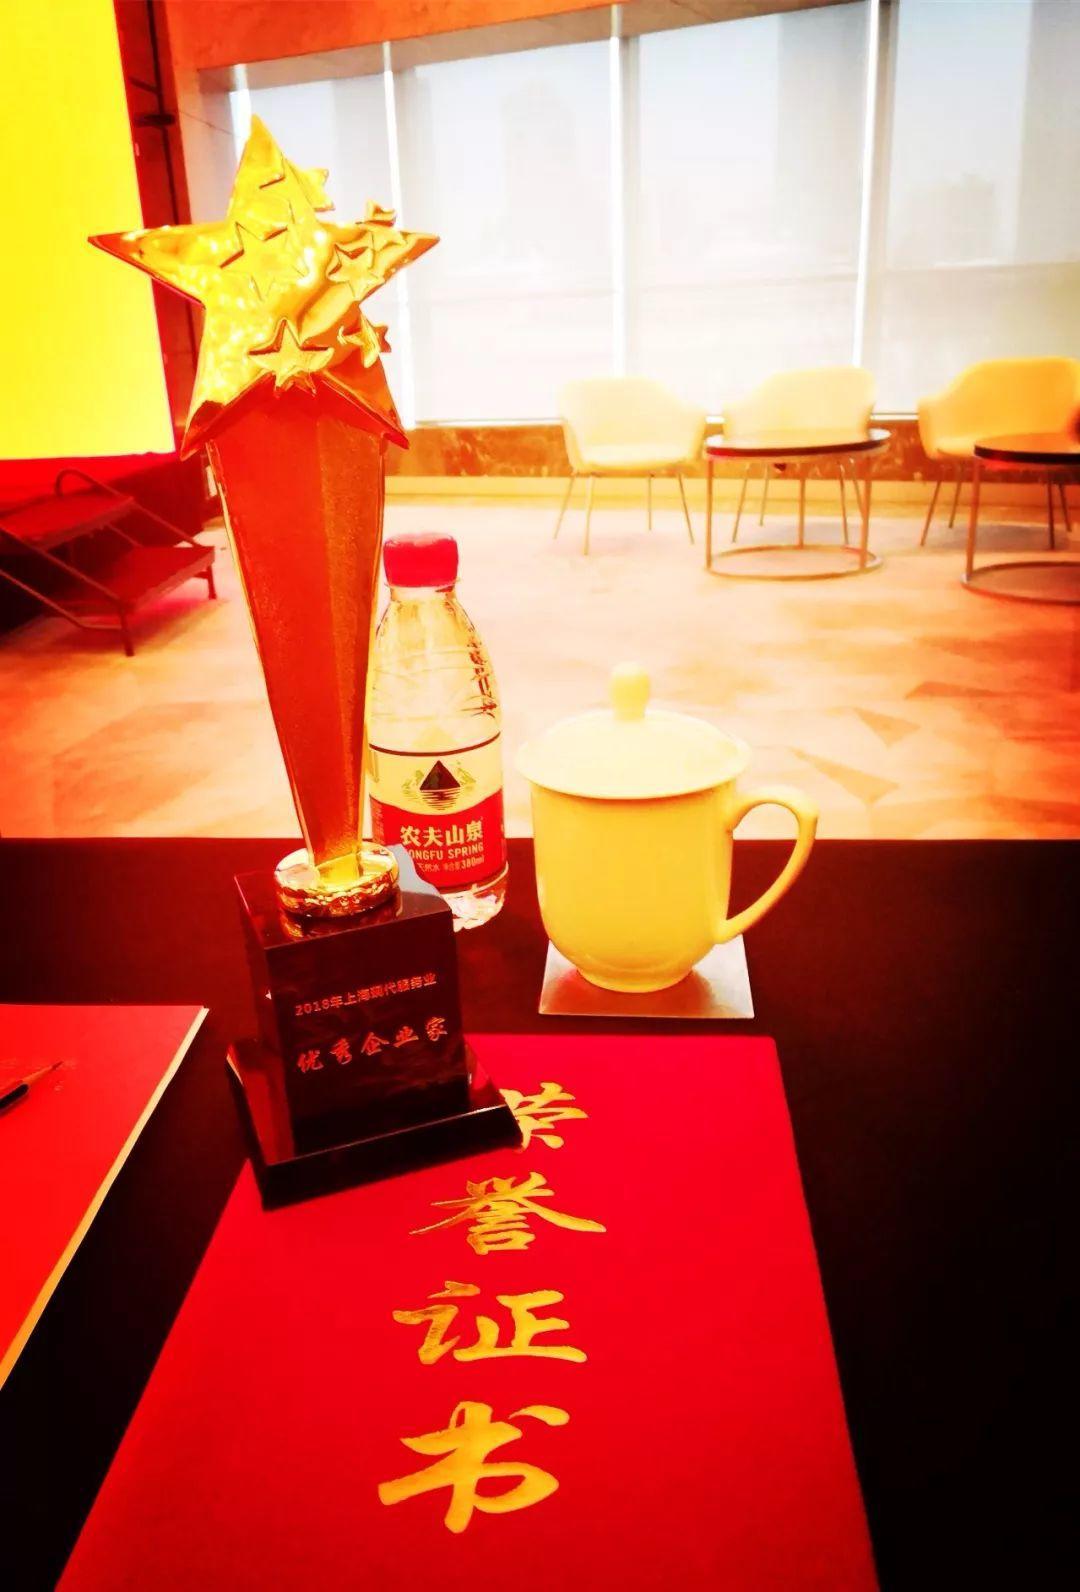 "LDG喜报︱叶松青董事长荣获""2018年上海现代服务业优秀企业家""称号"